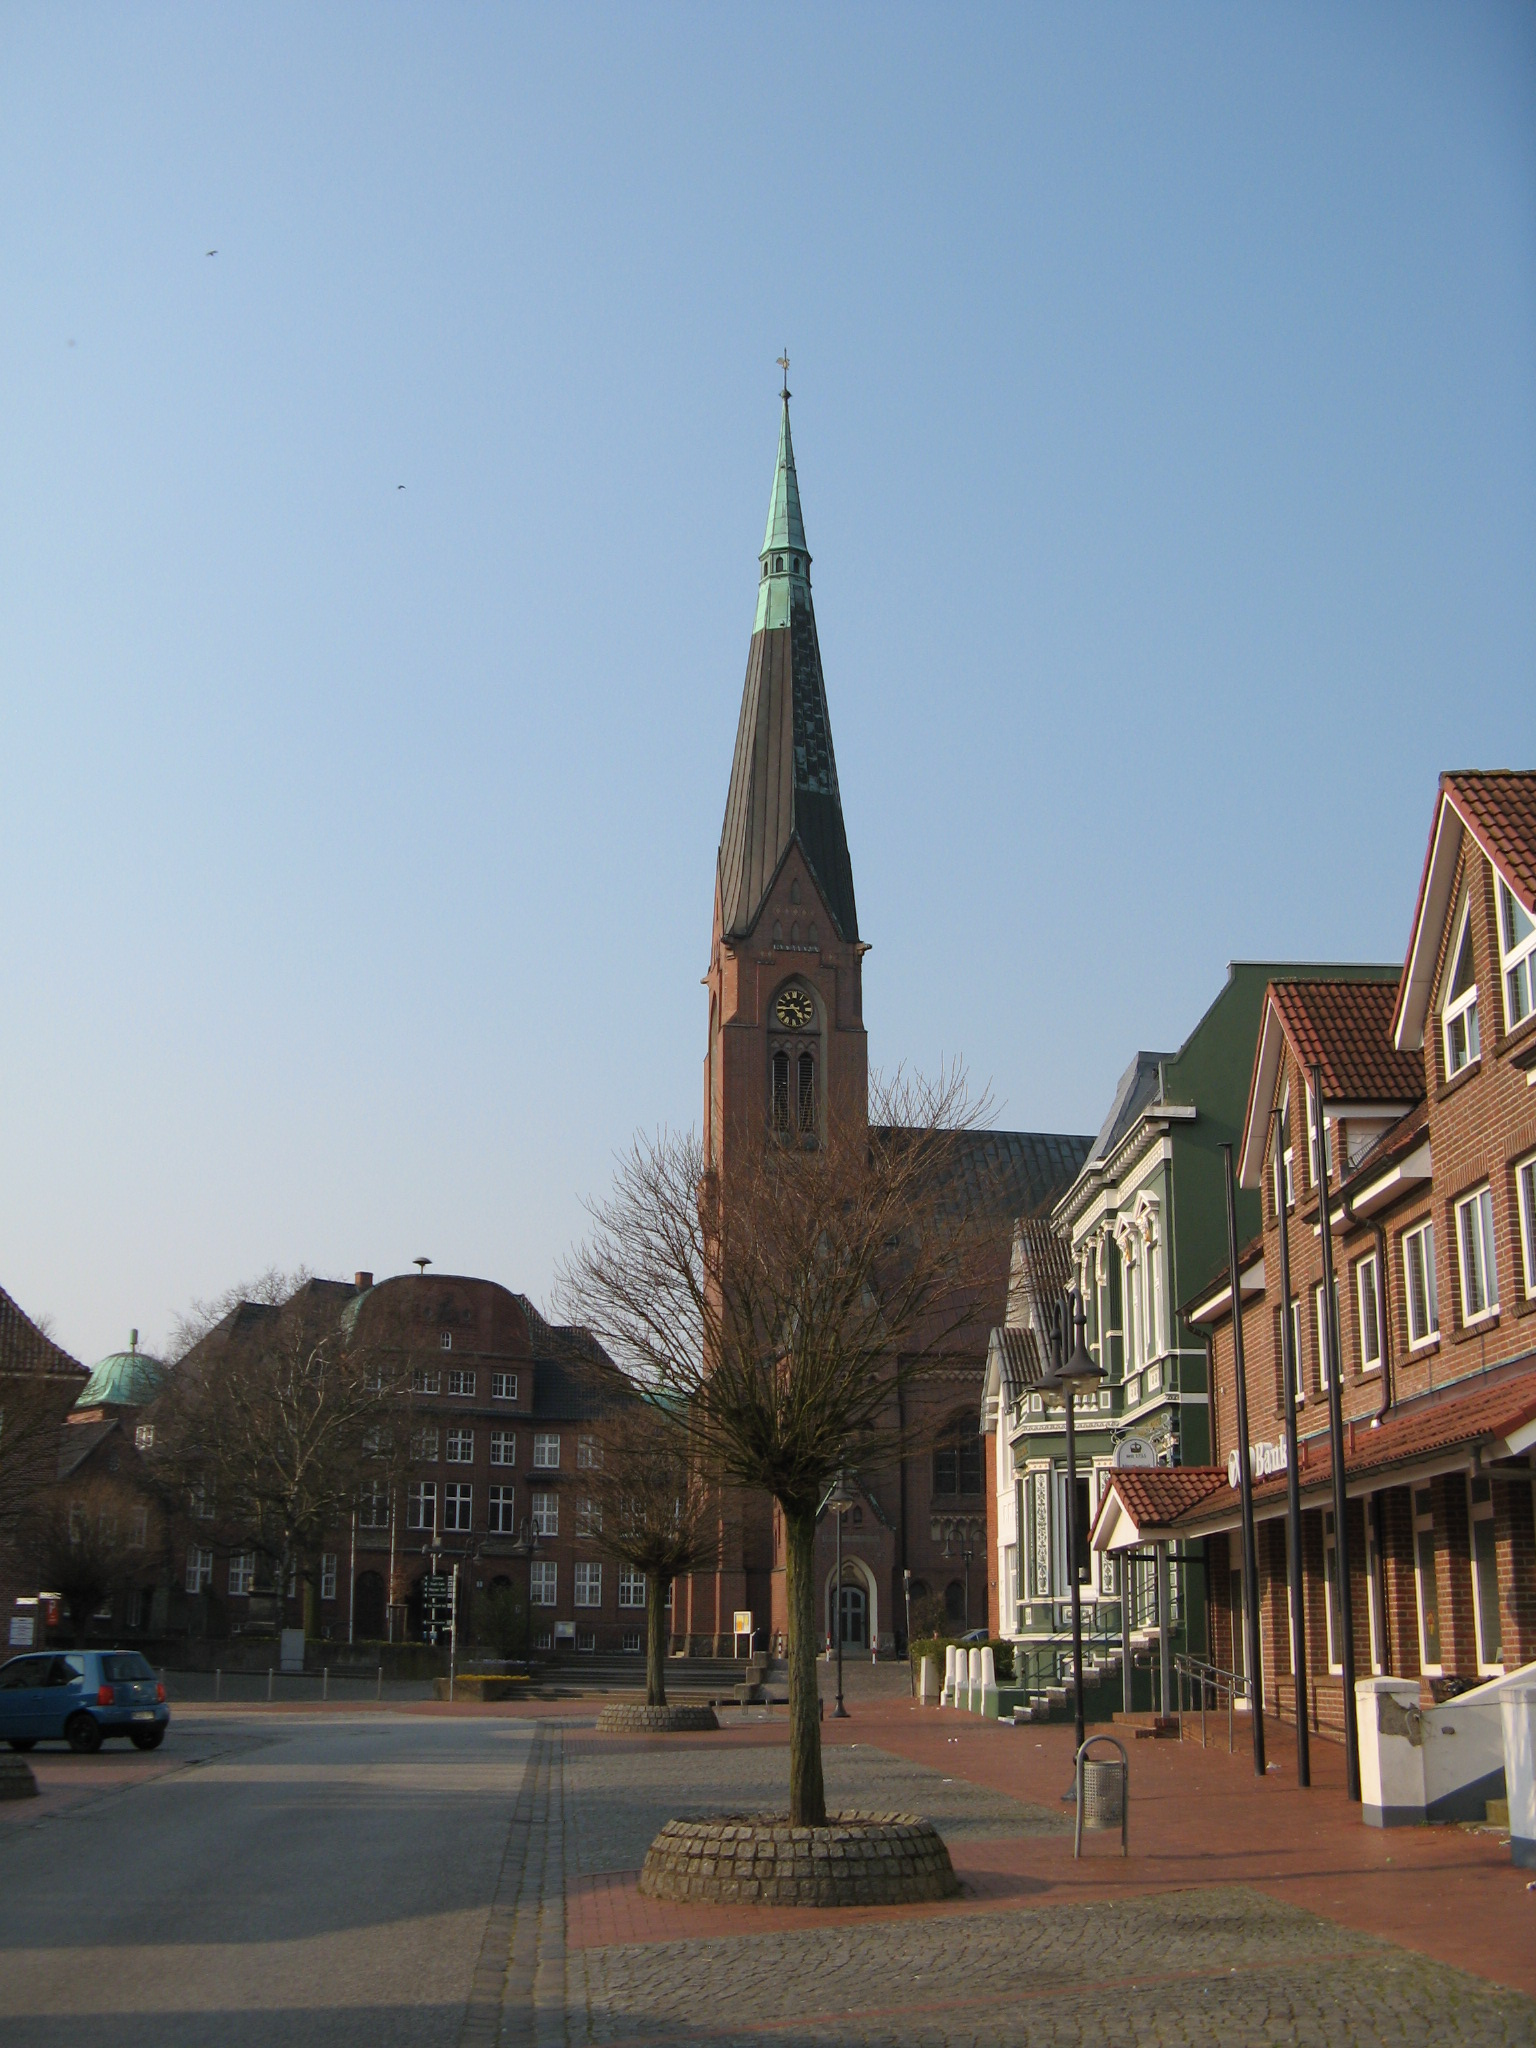 File:Marne rathaus, kirche, apotheke.jpg - Wikimedia Commons